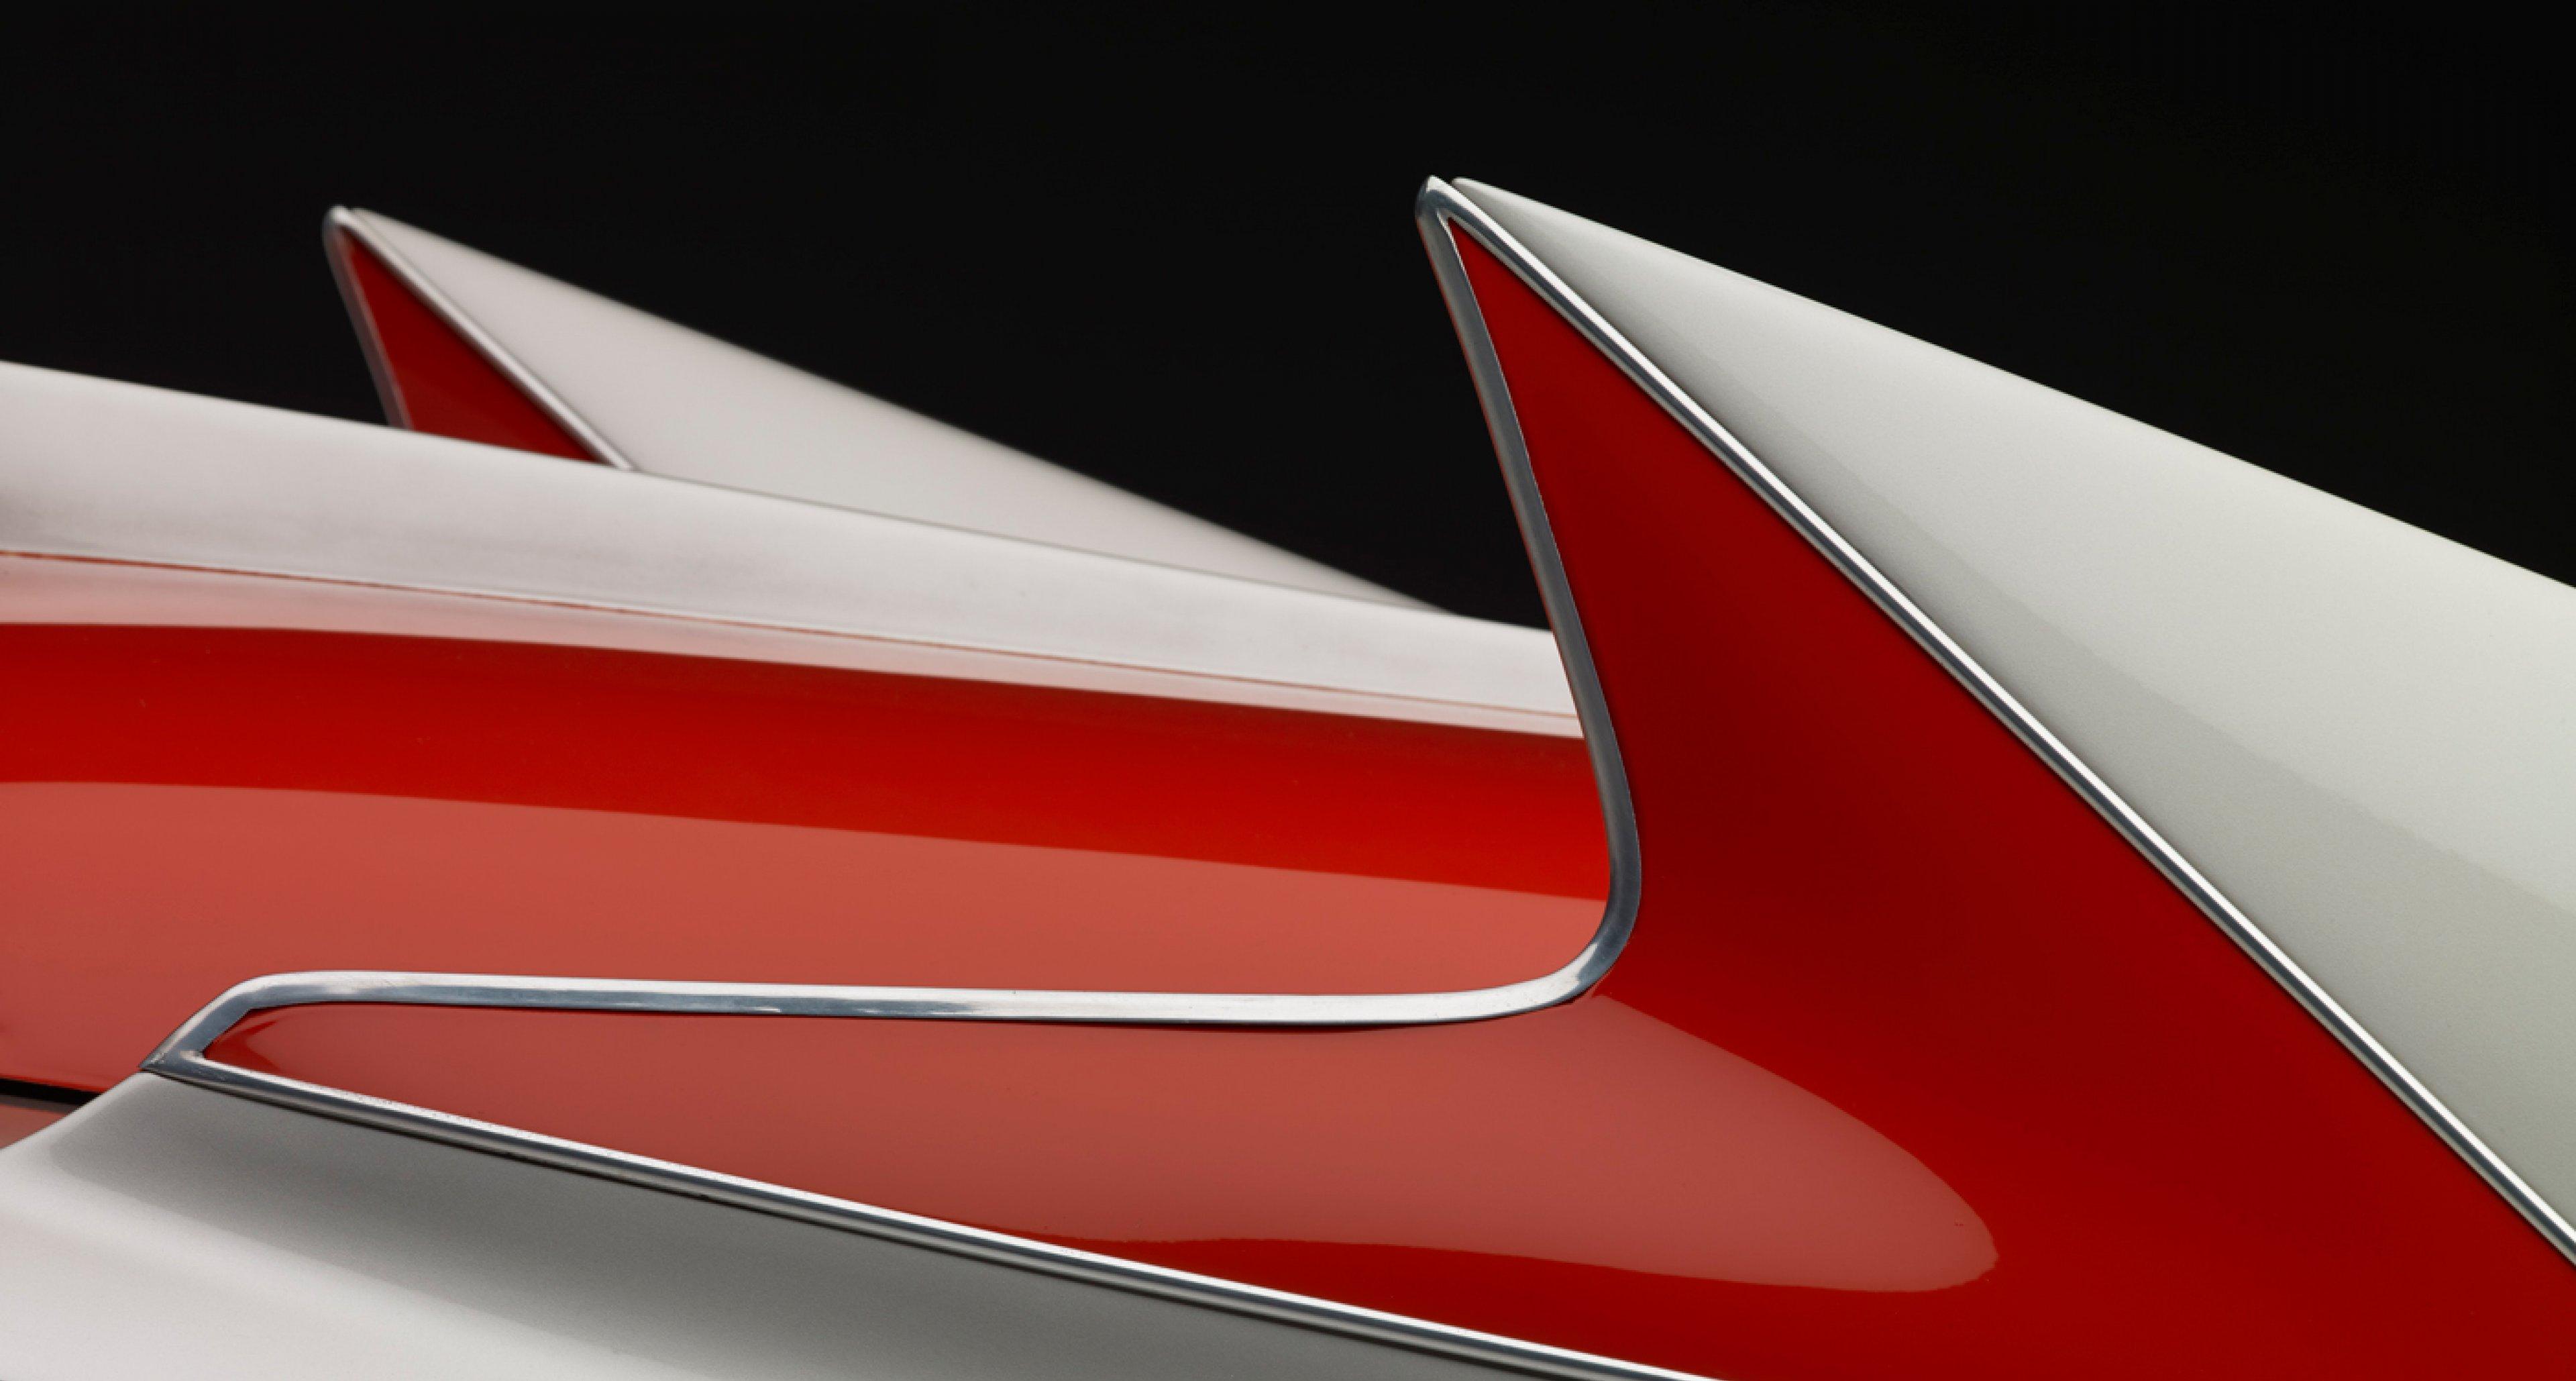 1955 Chrysler Ghia Gilda. Collection of Kathleen Redmond and Scott Grundfor. Image © 2015 Michael Furman